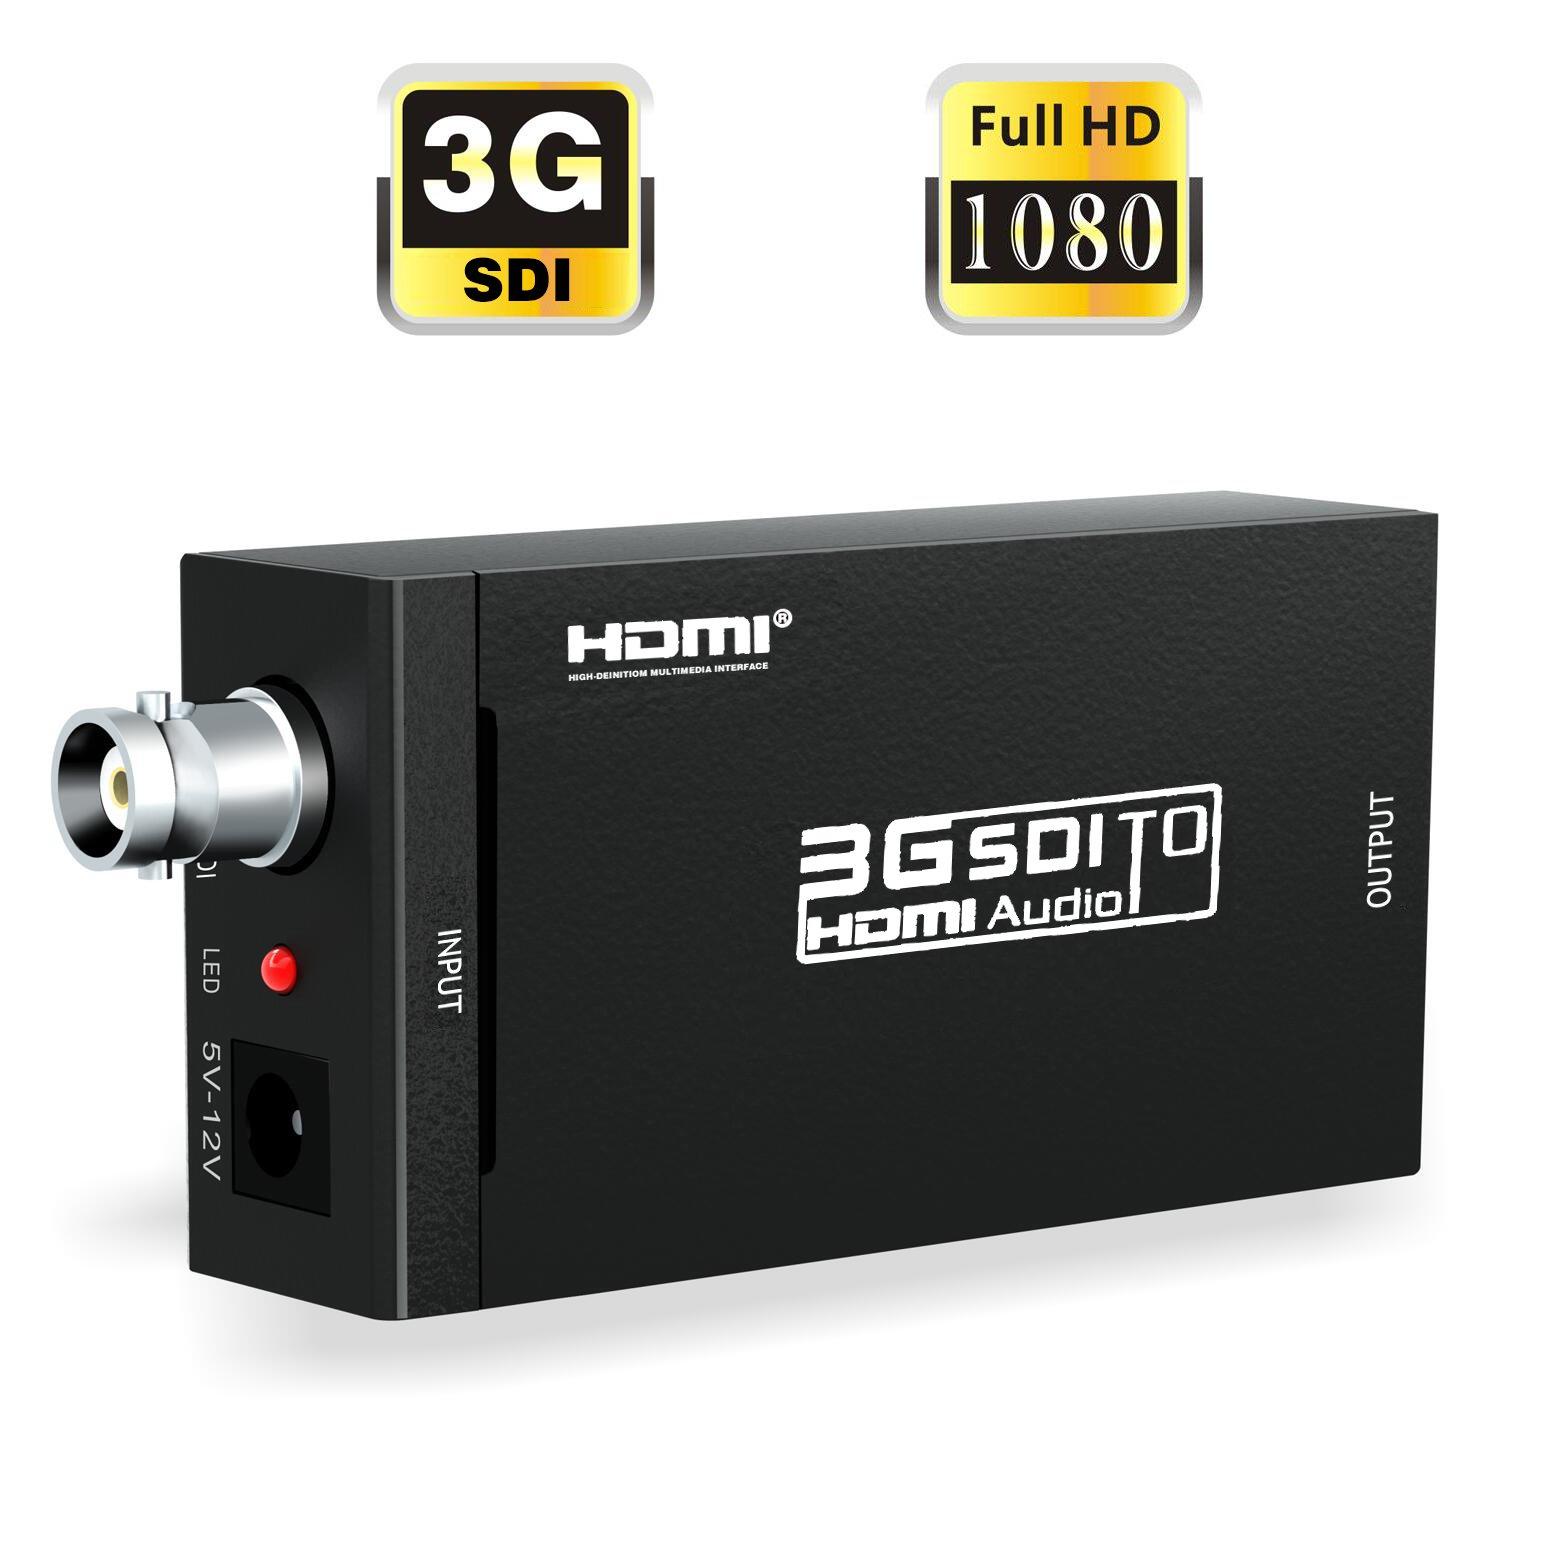 SDI to HDMI, Ablewe SDI HD-SDI 3G-SDI to HDMI 720p/1080p Adapter Video Converter with Embedded Audio by Ablewe